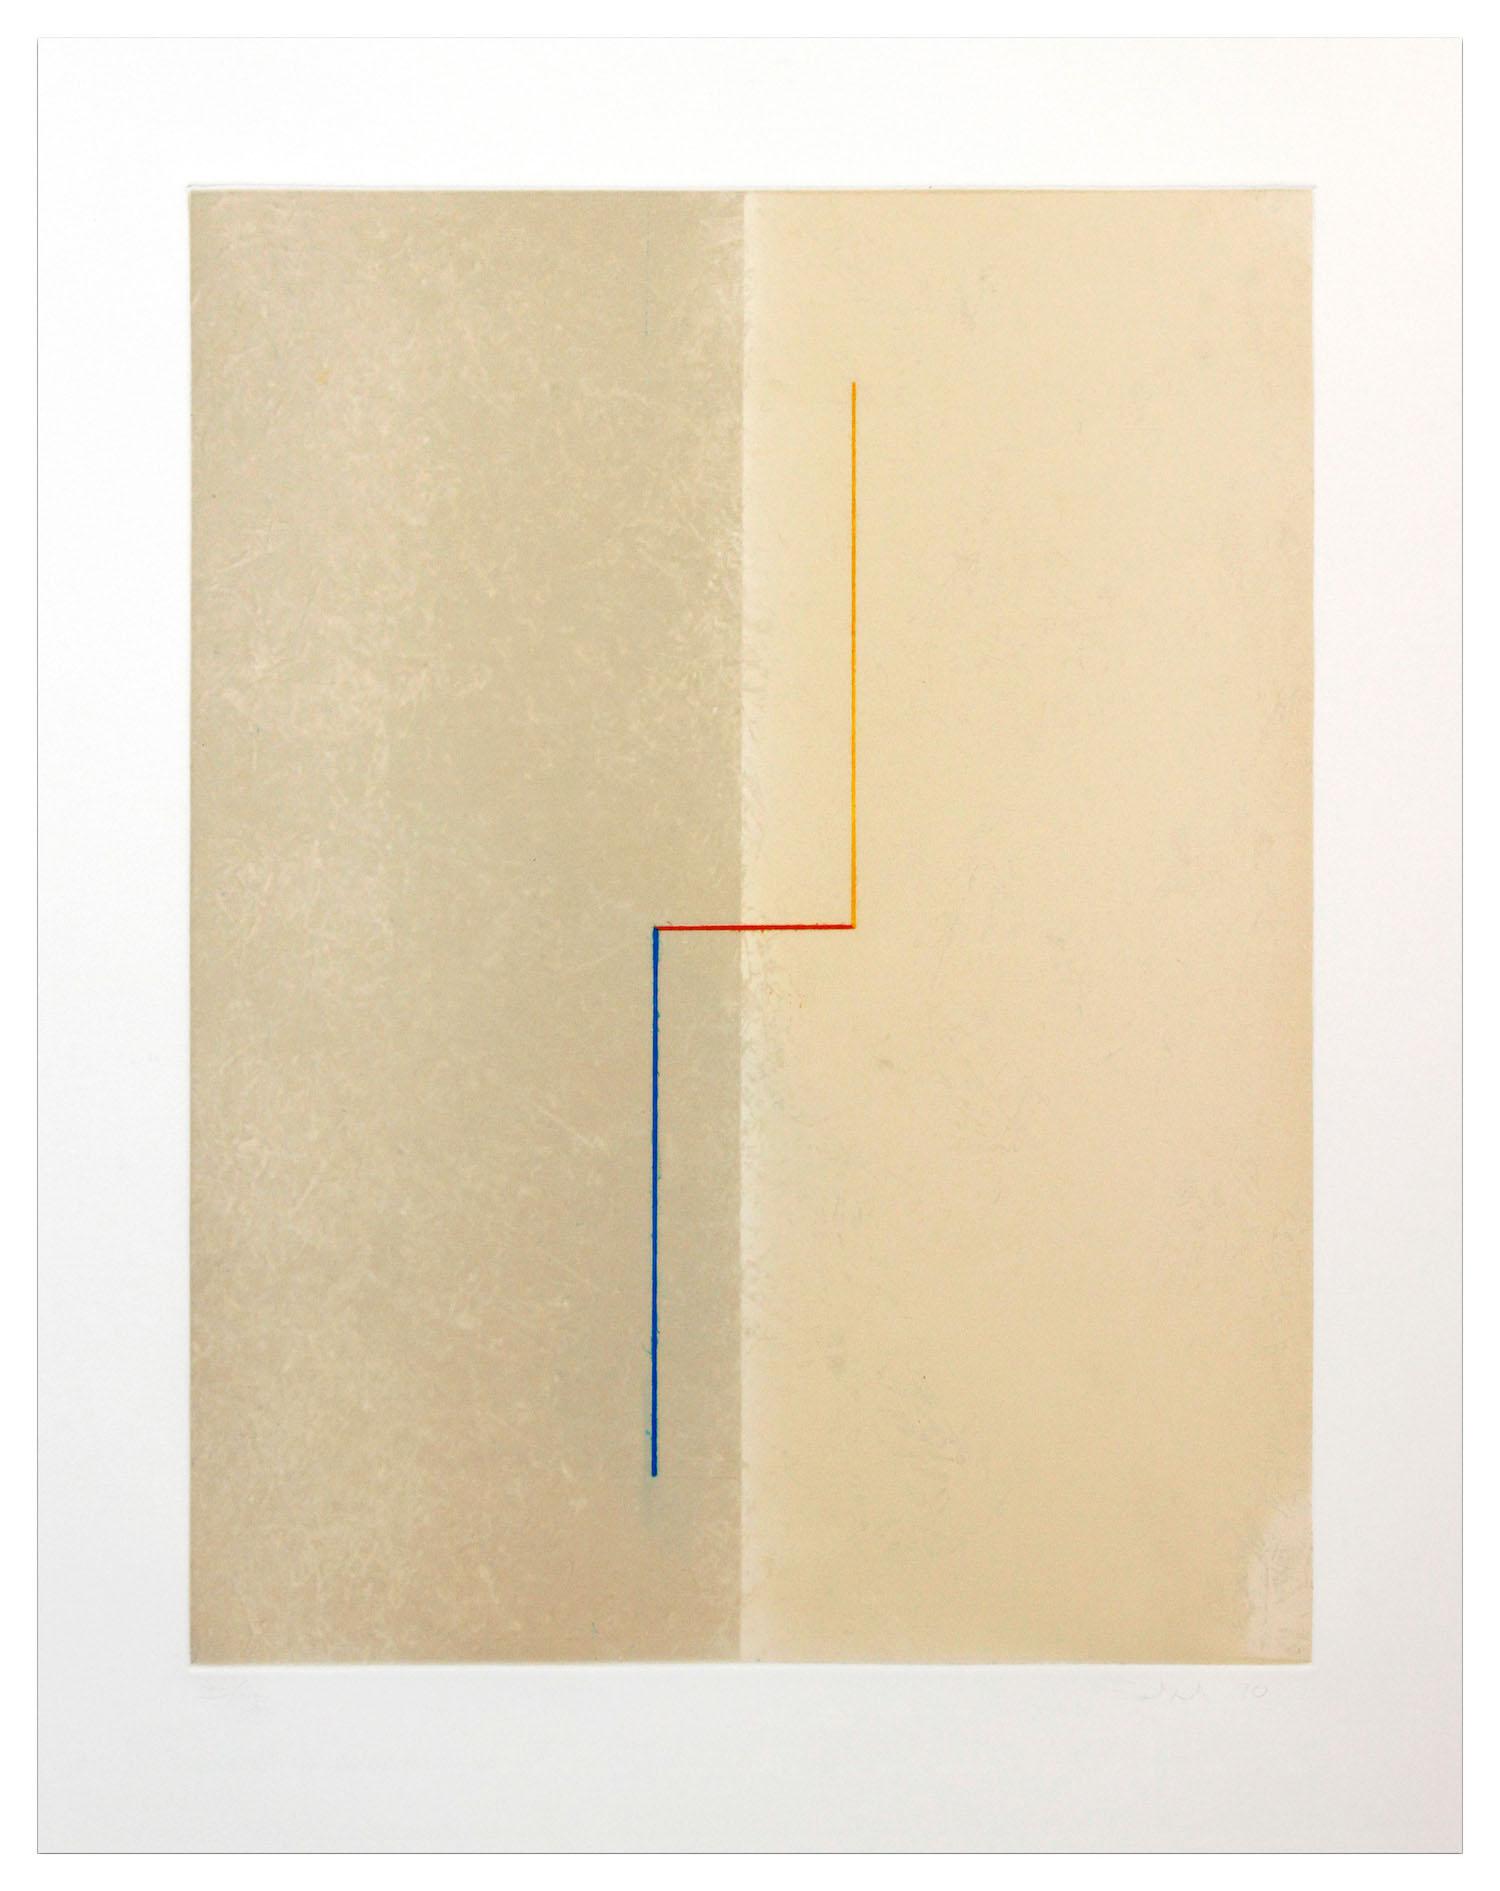 Photo: courtesy Krakow Witkin Gallery, Boston